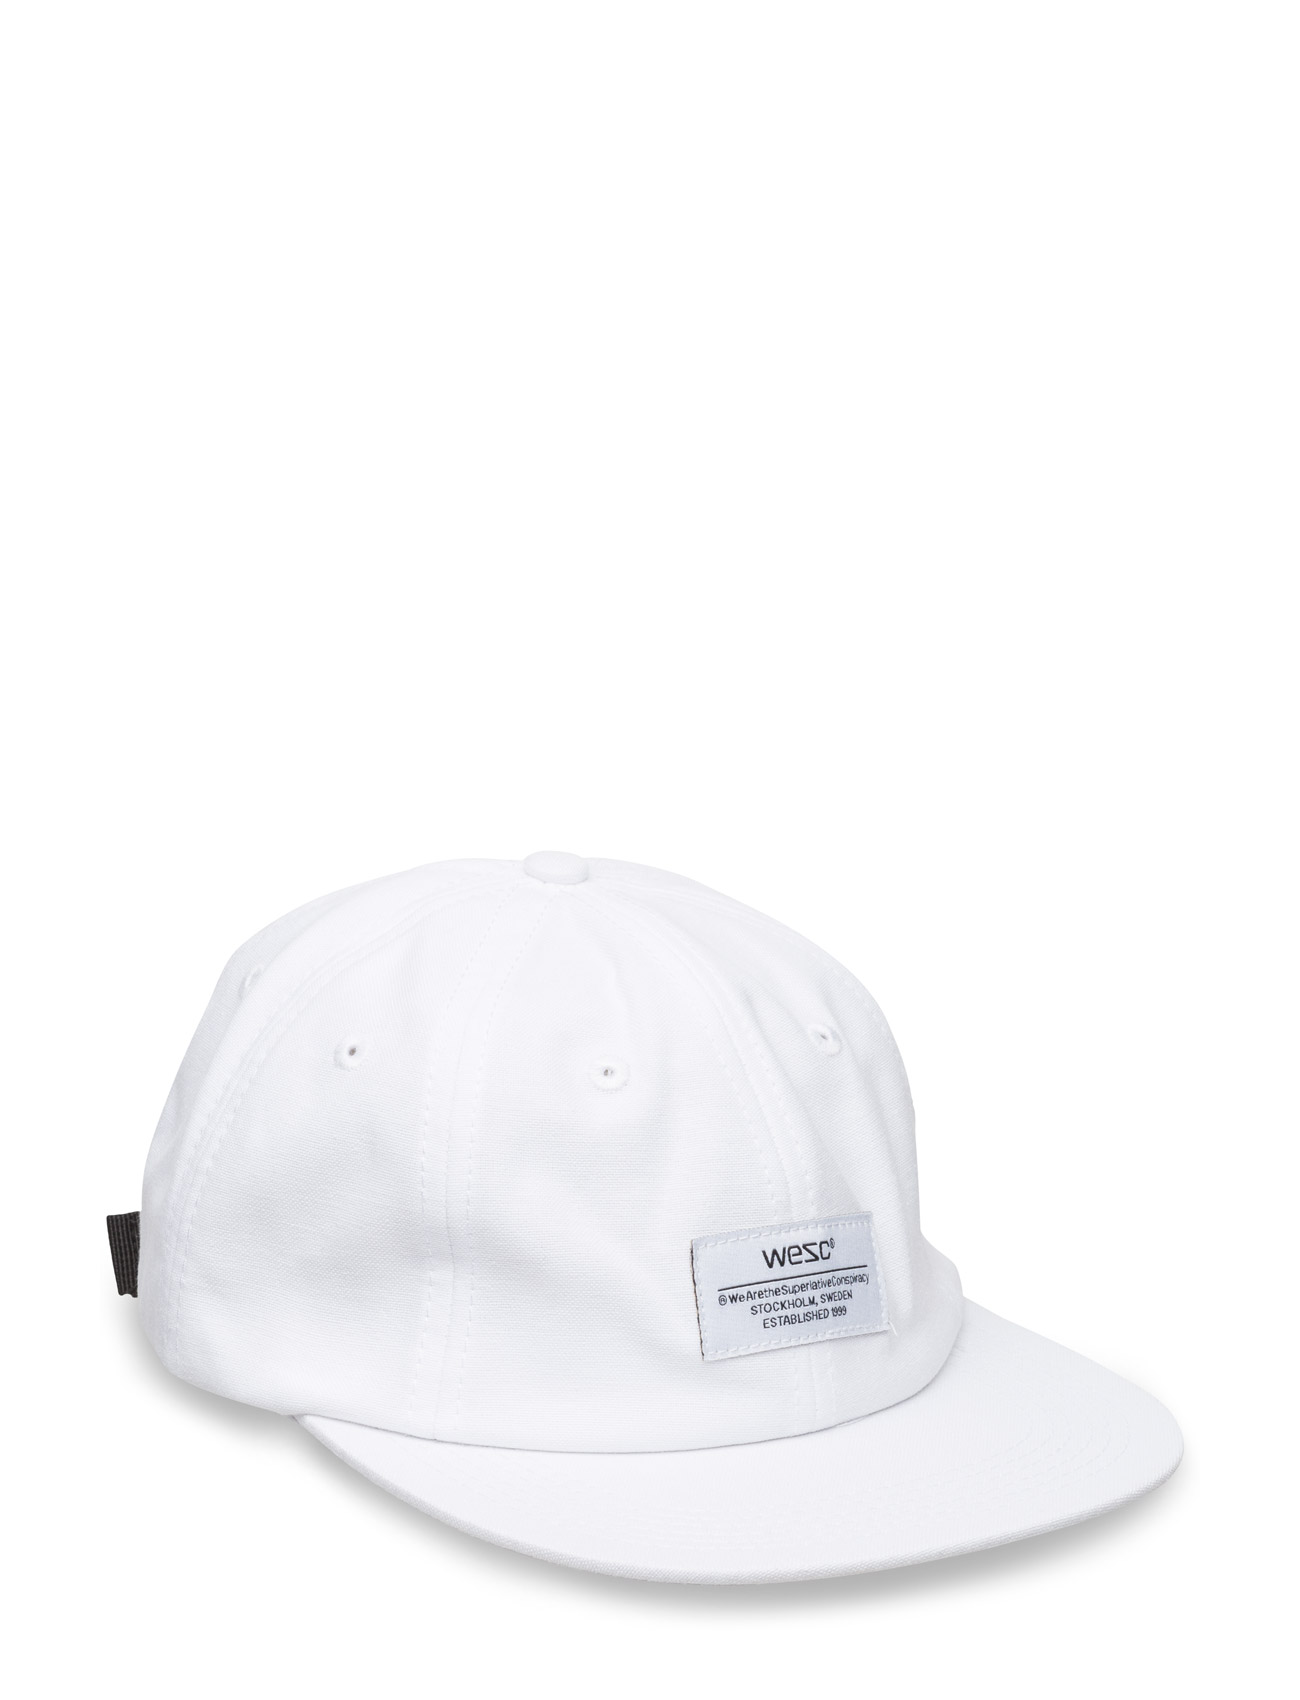 wesc Antifit strapback baseball cap fra boozt.com dk